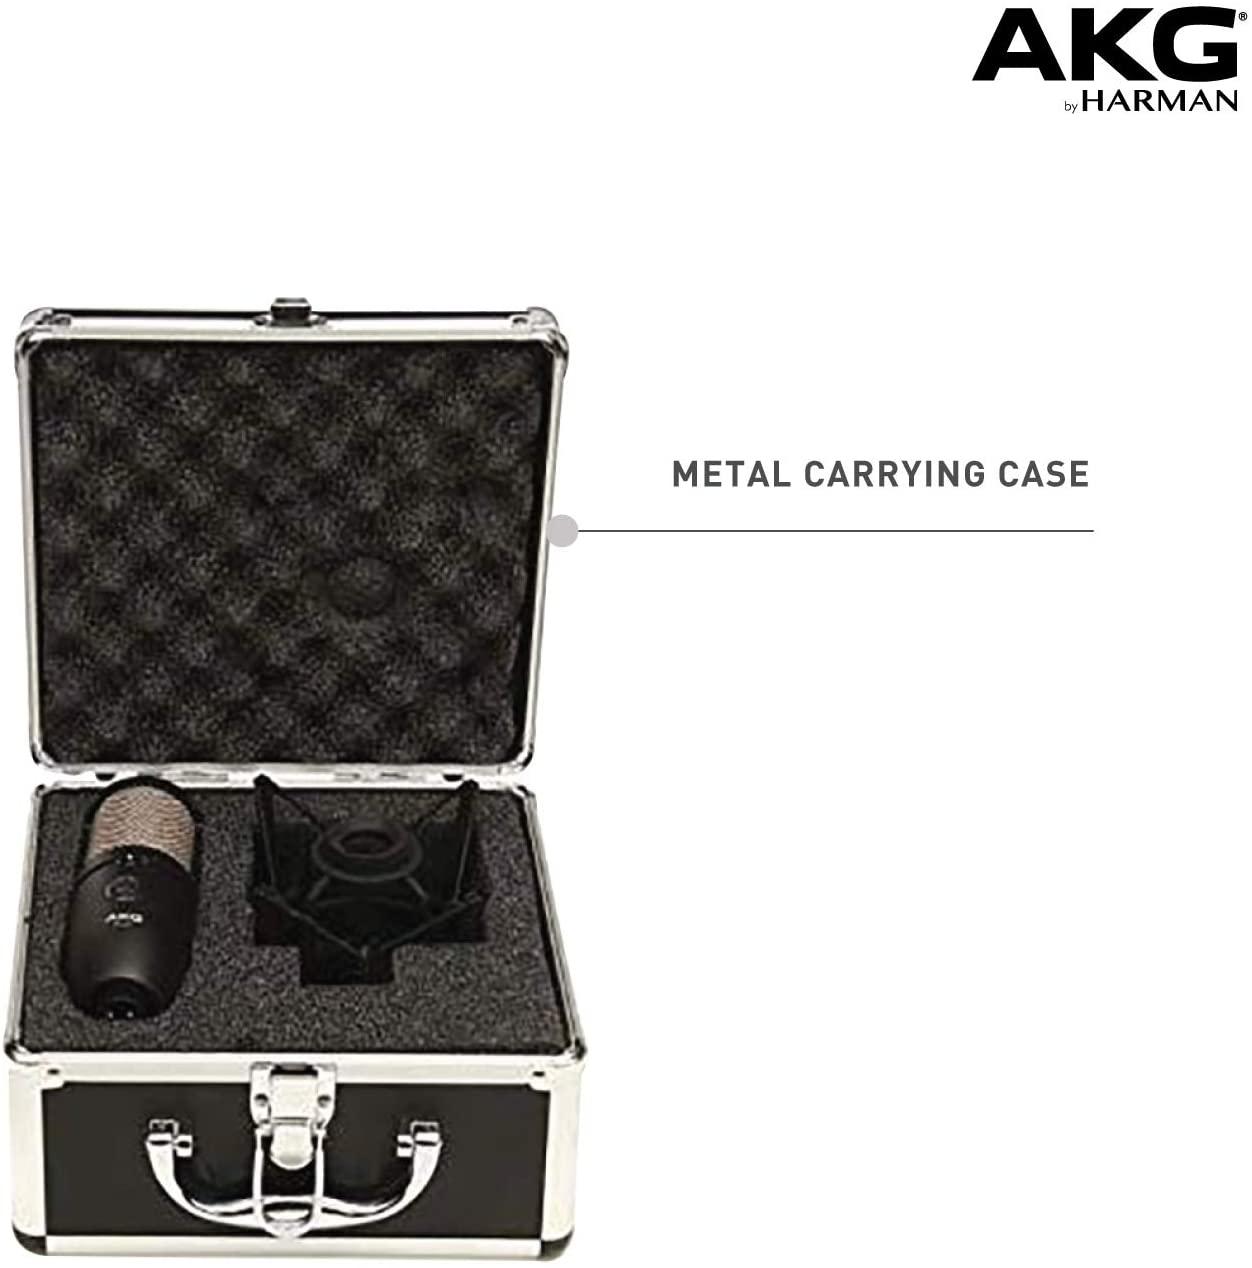 MICROFONE AKG PERCEPTION P420